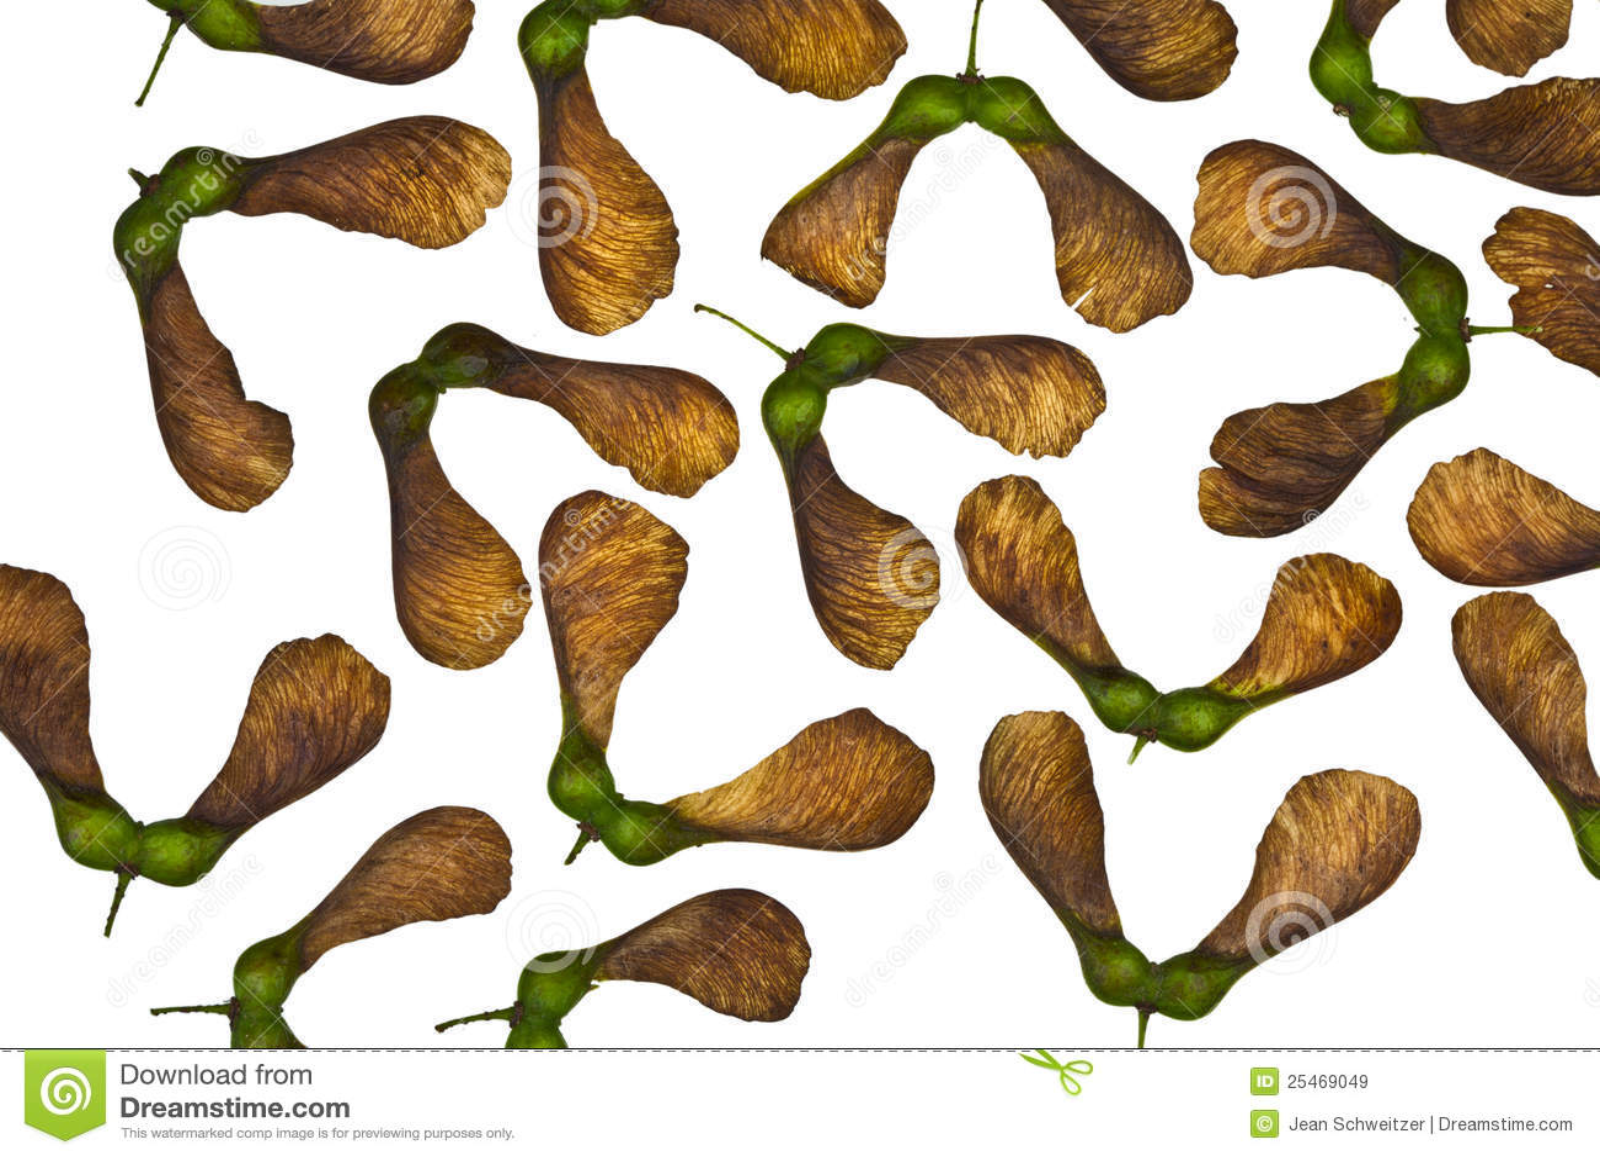 Maple Tree Fruit Royalty Free Stock Images - Image: 25469049